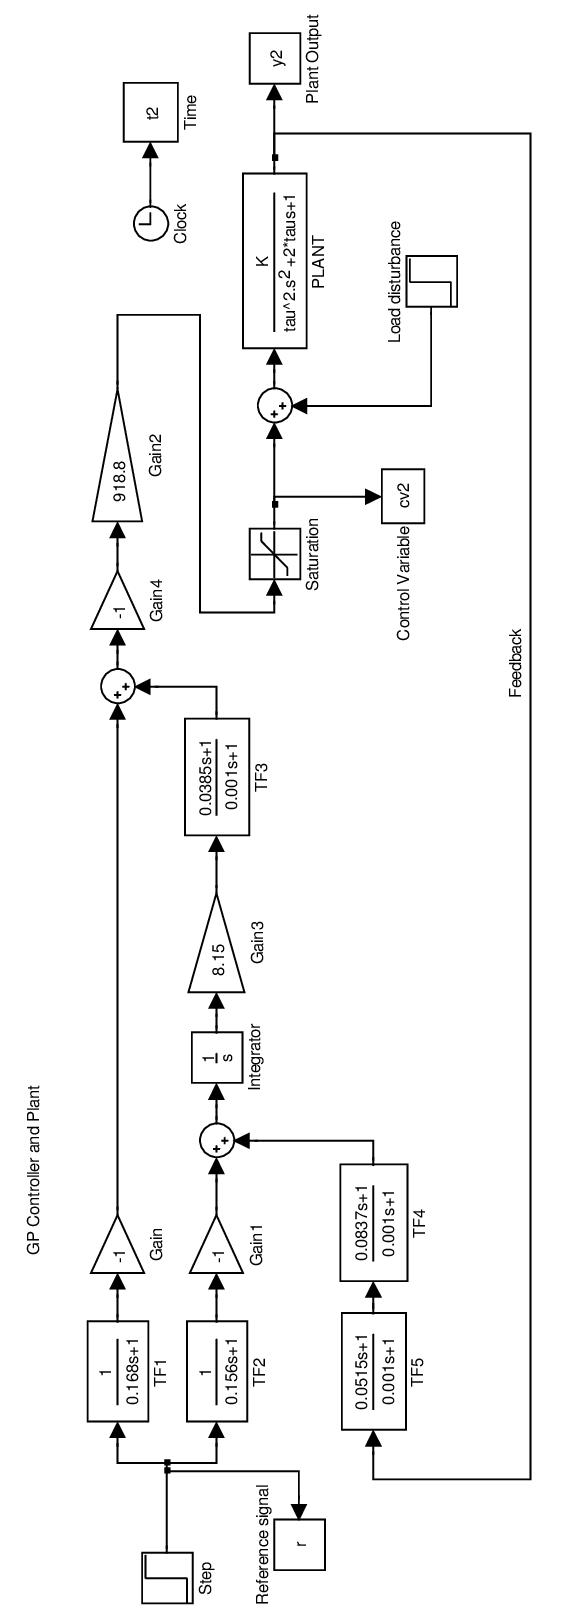 medium resolution of 1 simulink block diagram of the gp controller